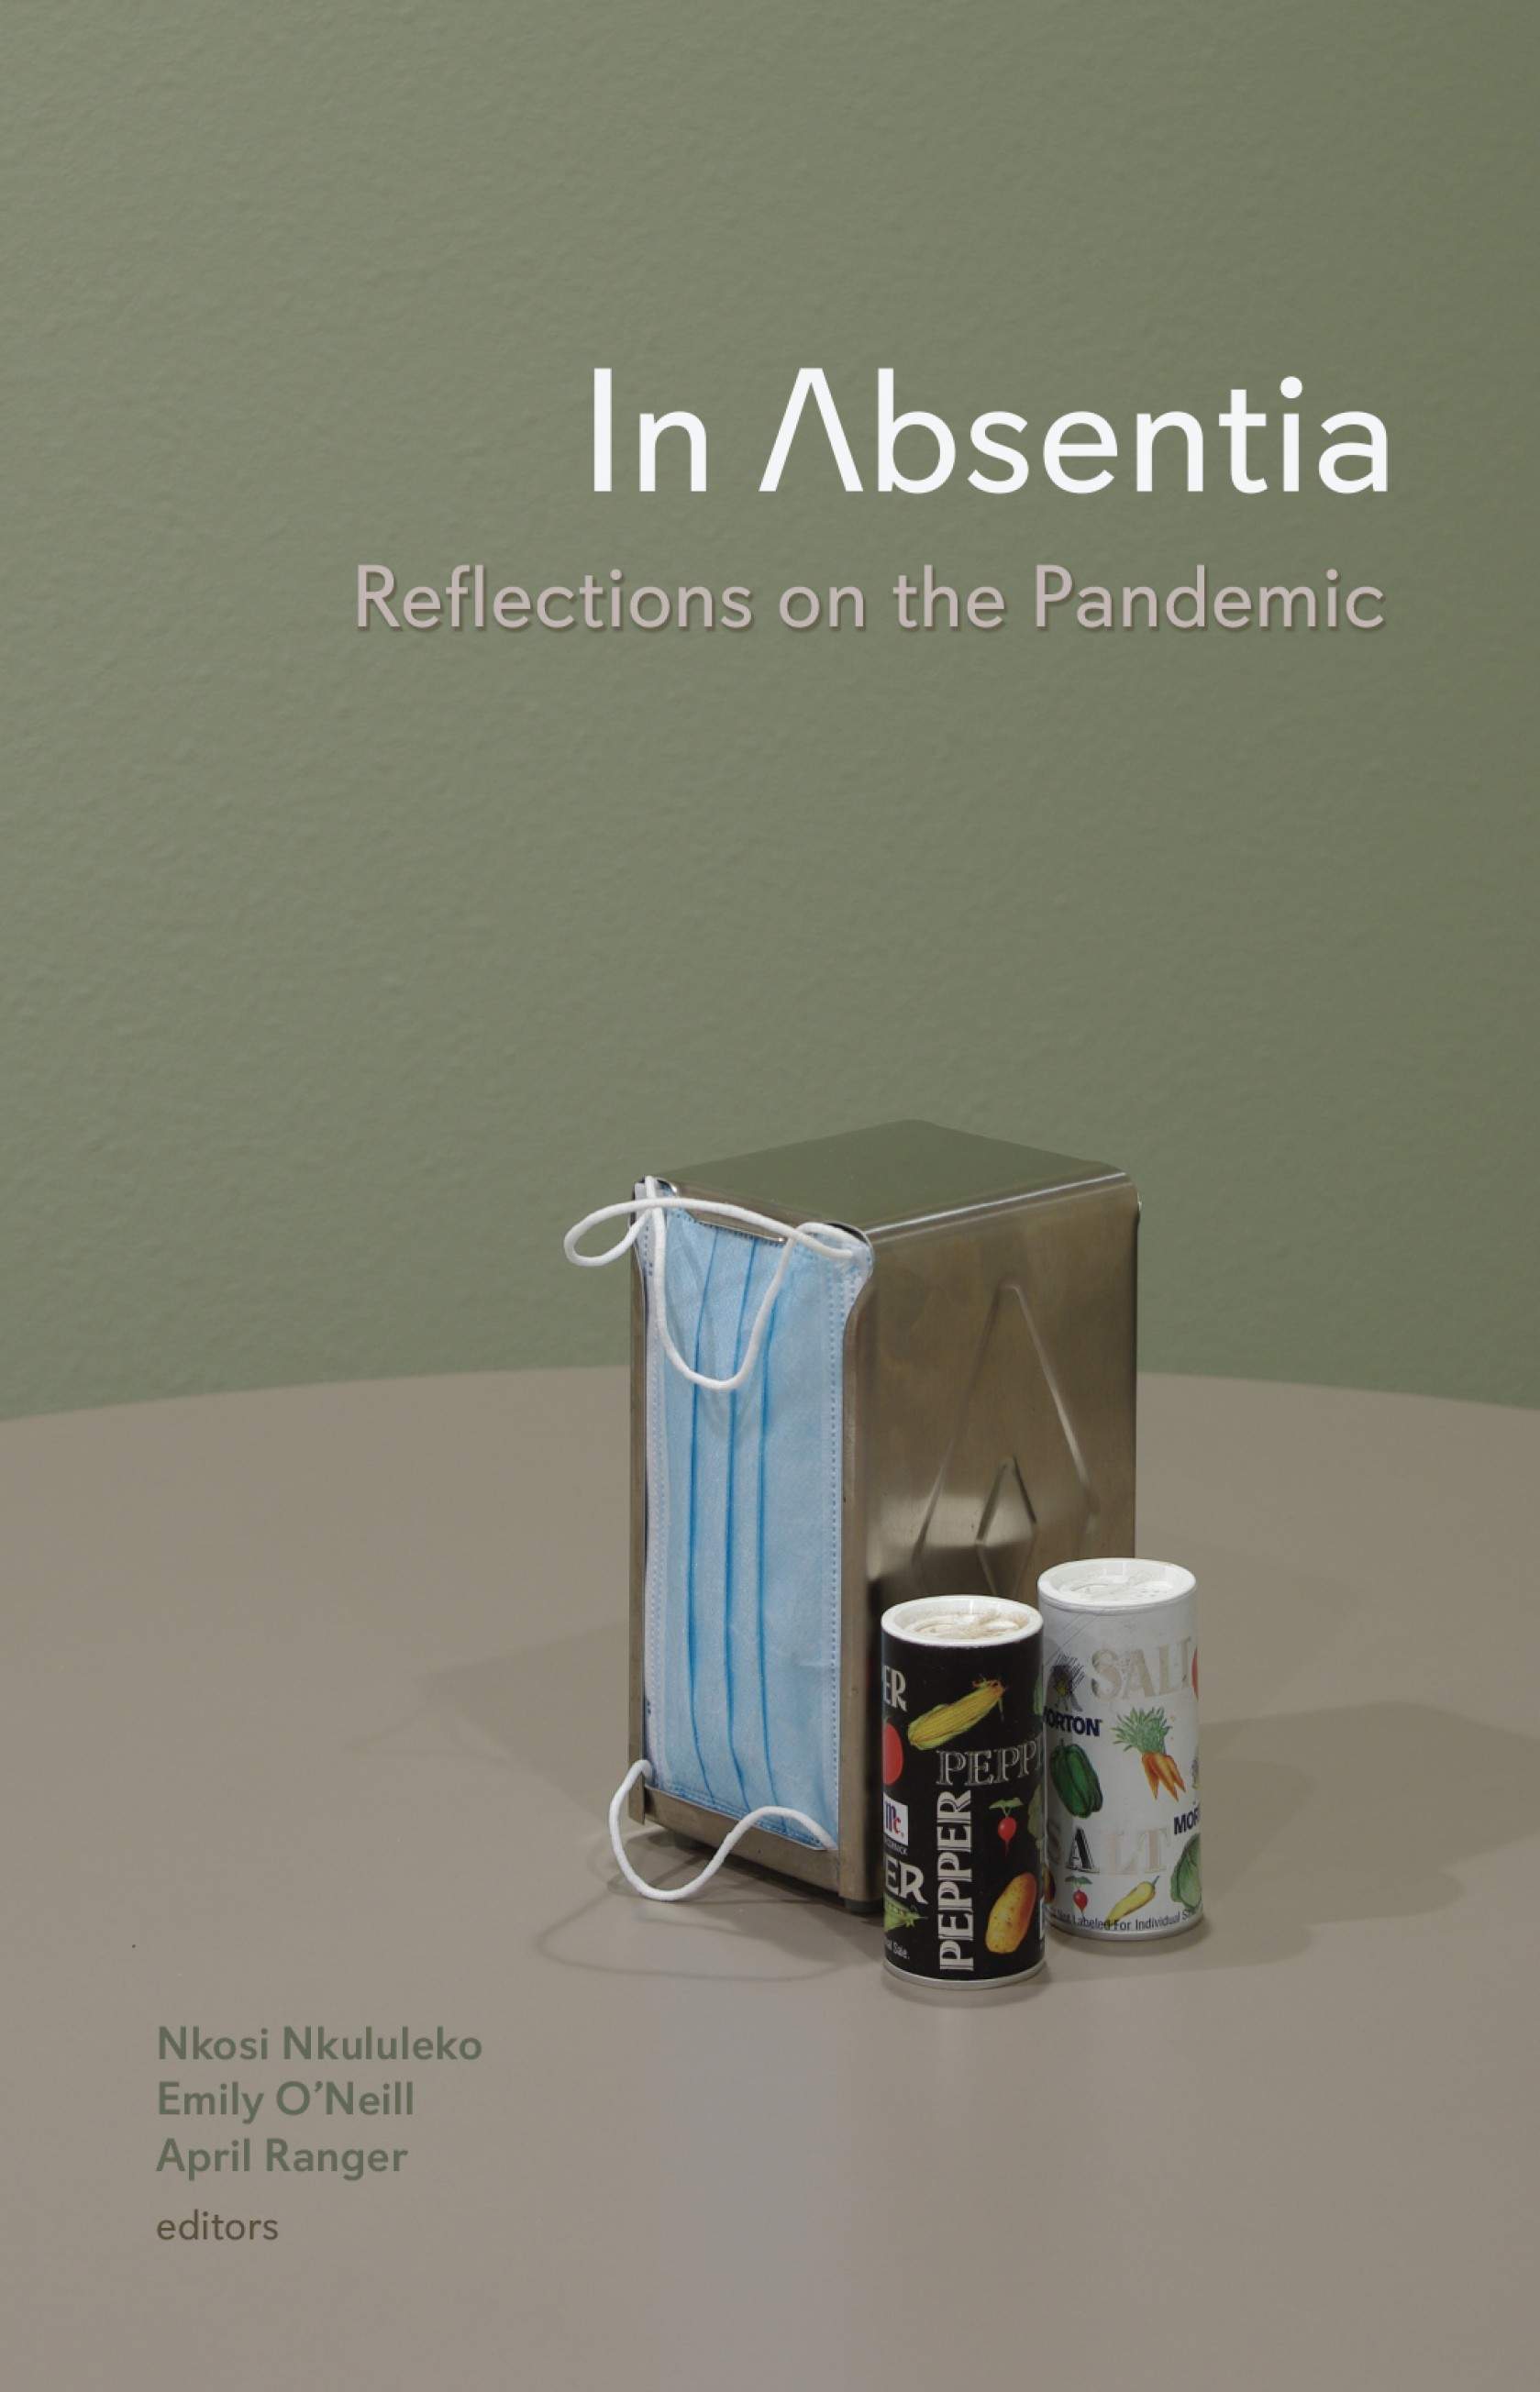 MOCA x In Absentia